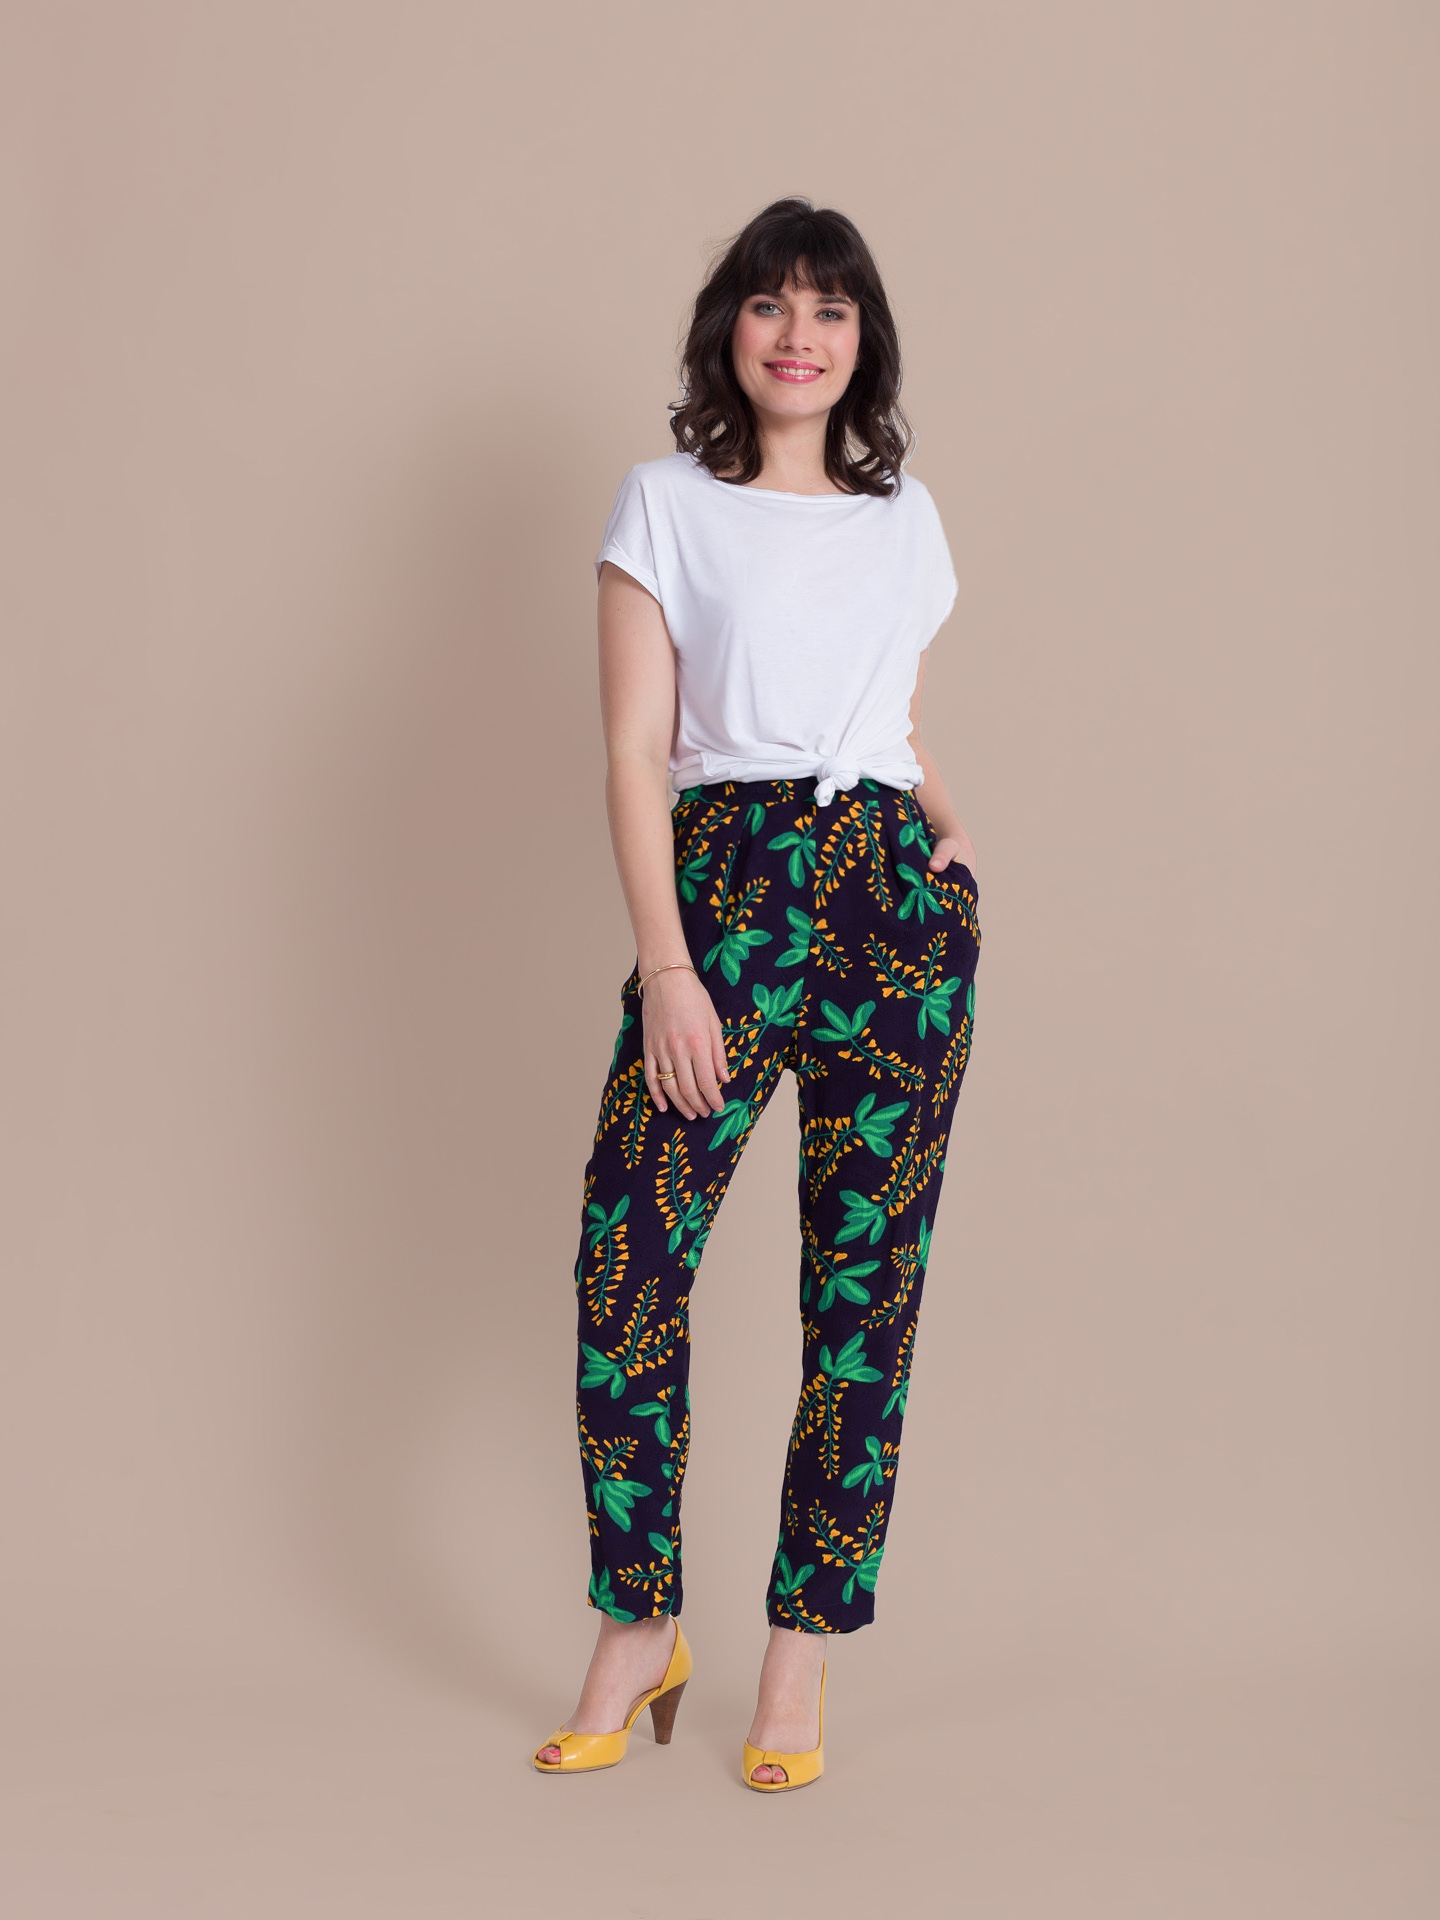 Pantalon Zootopy noir glycines